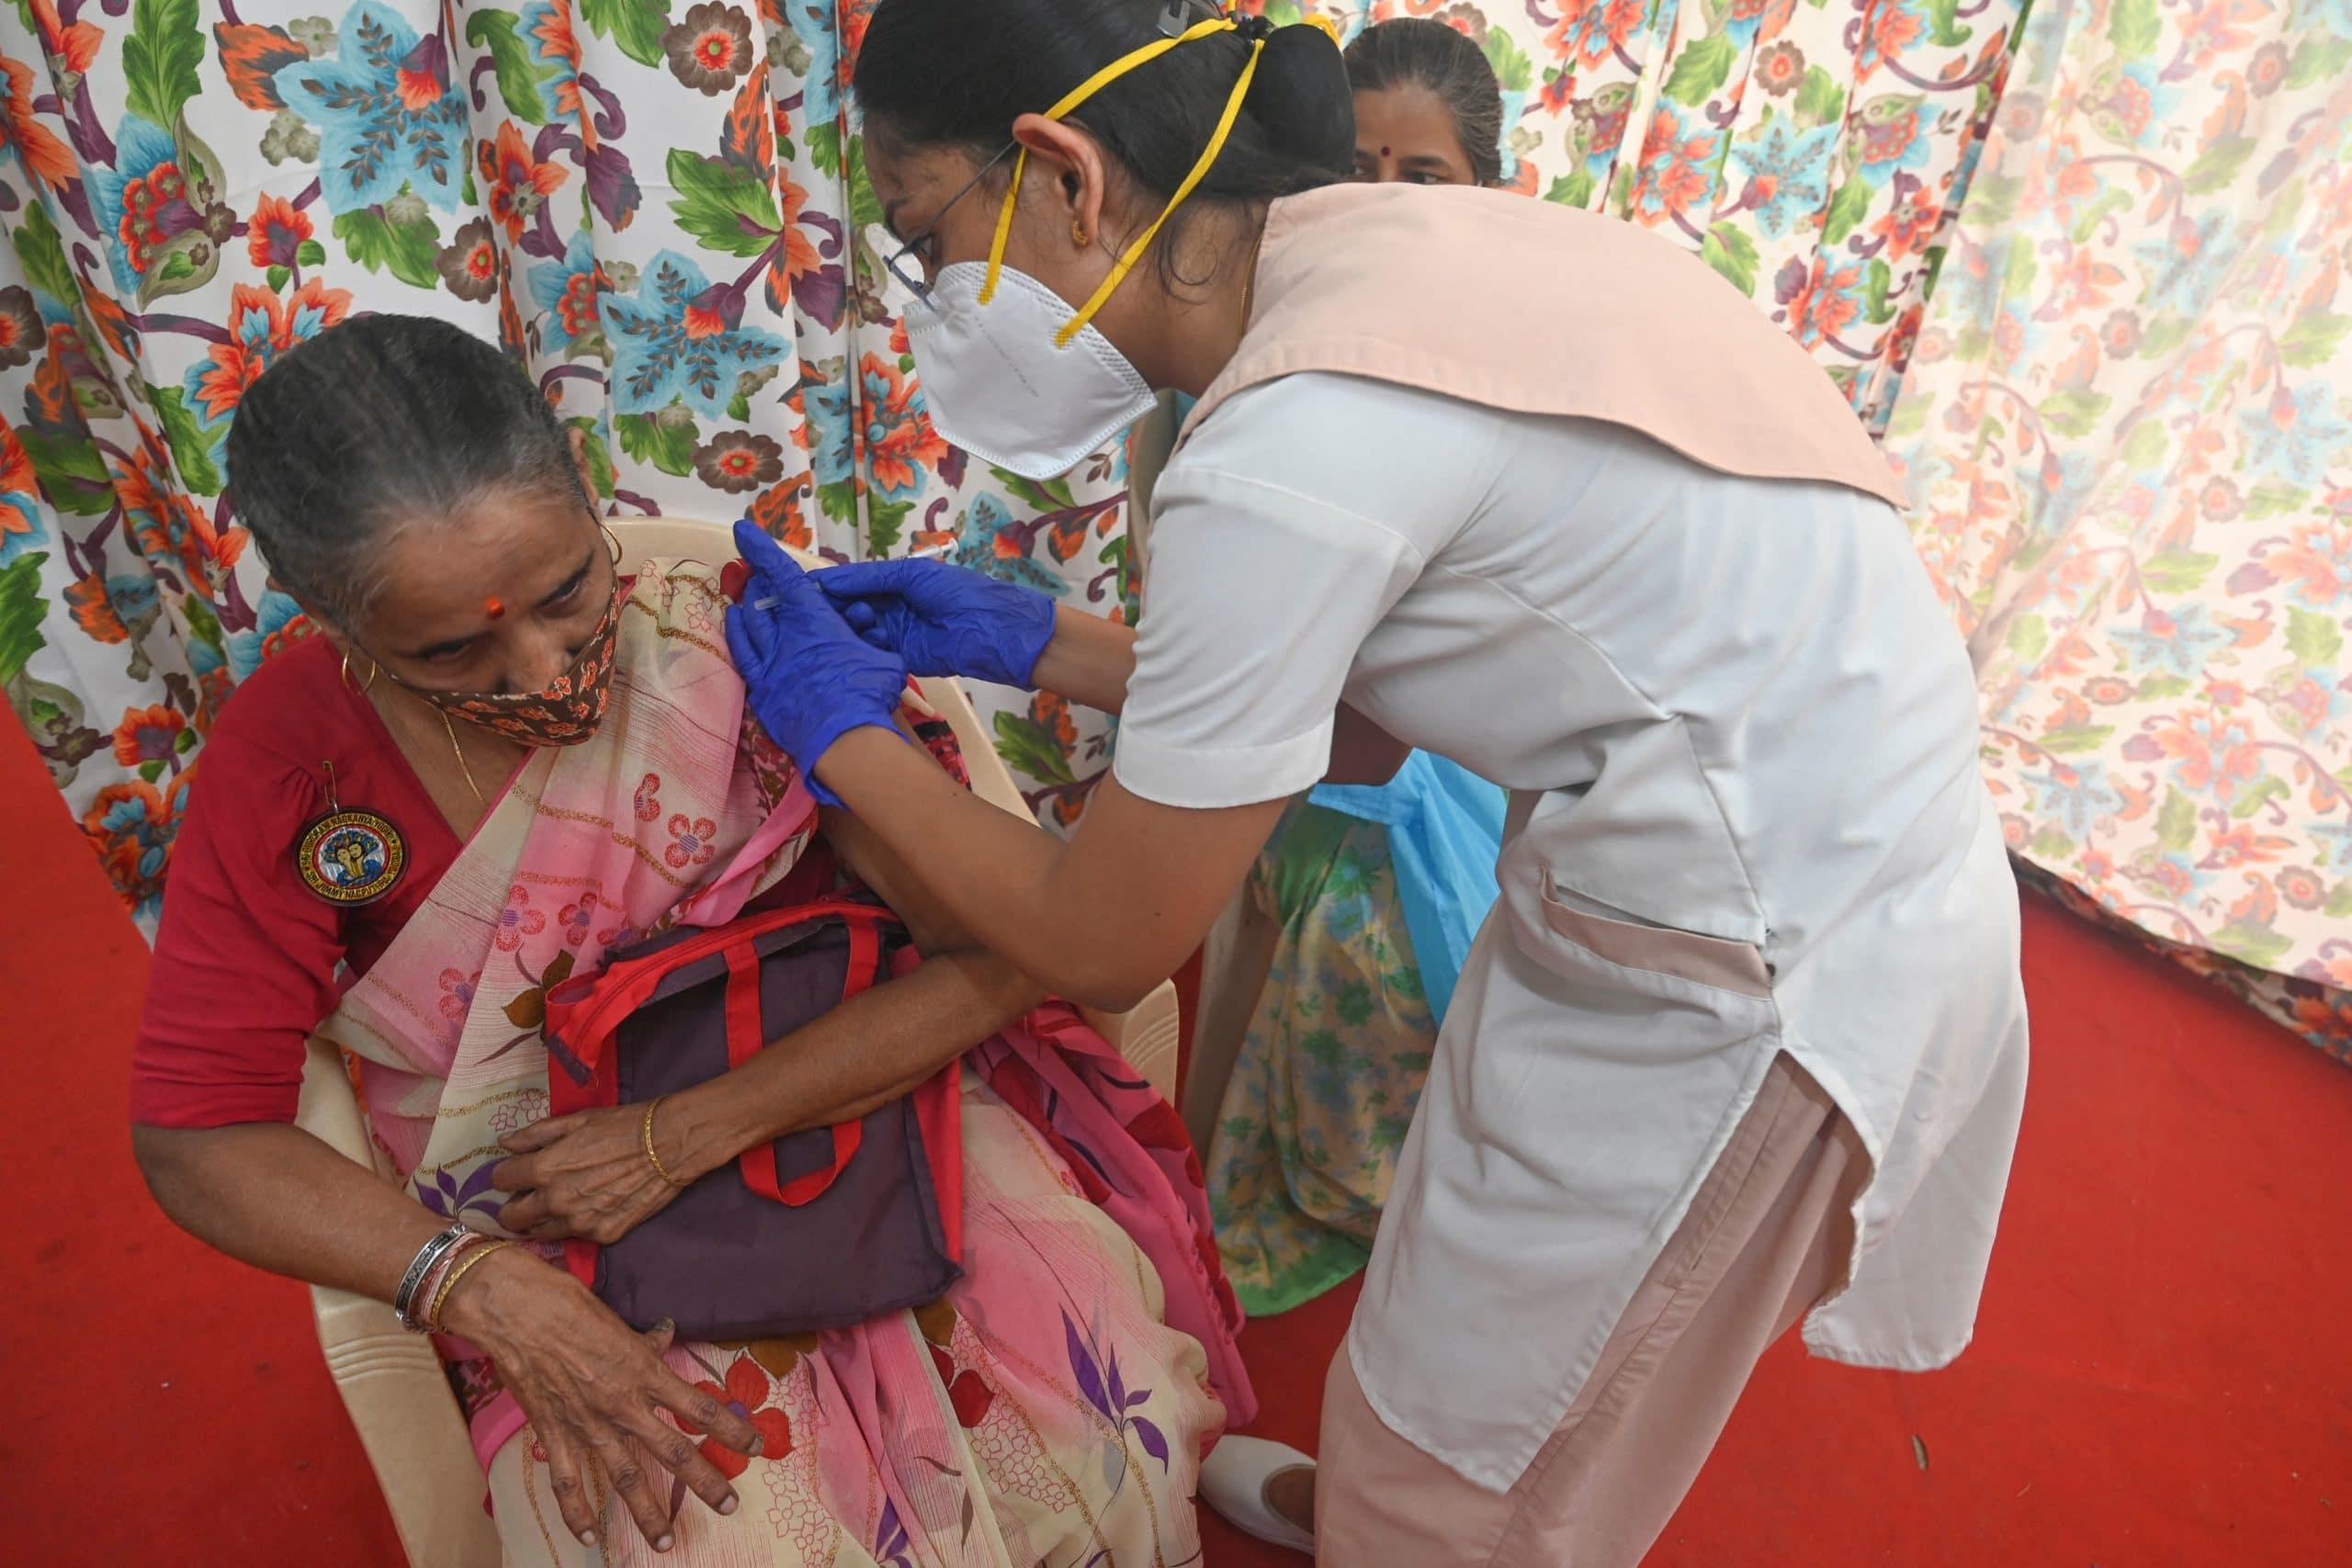 INDIA-HEALTH-VIRUS-VACCINES